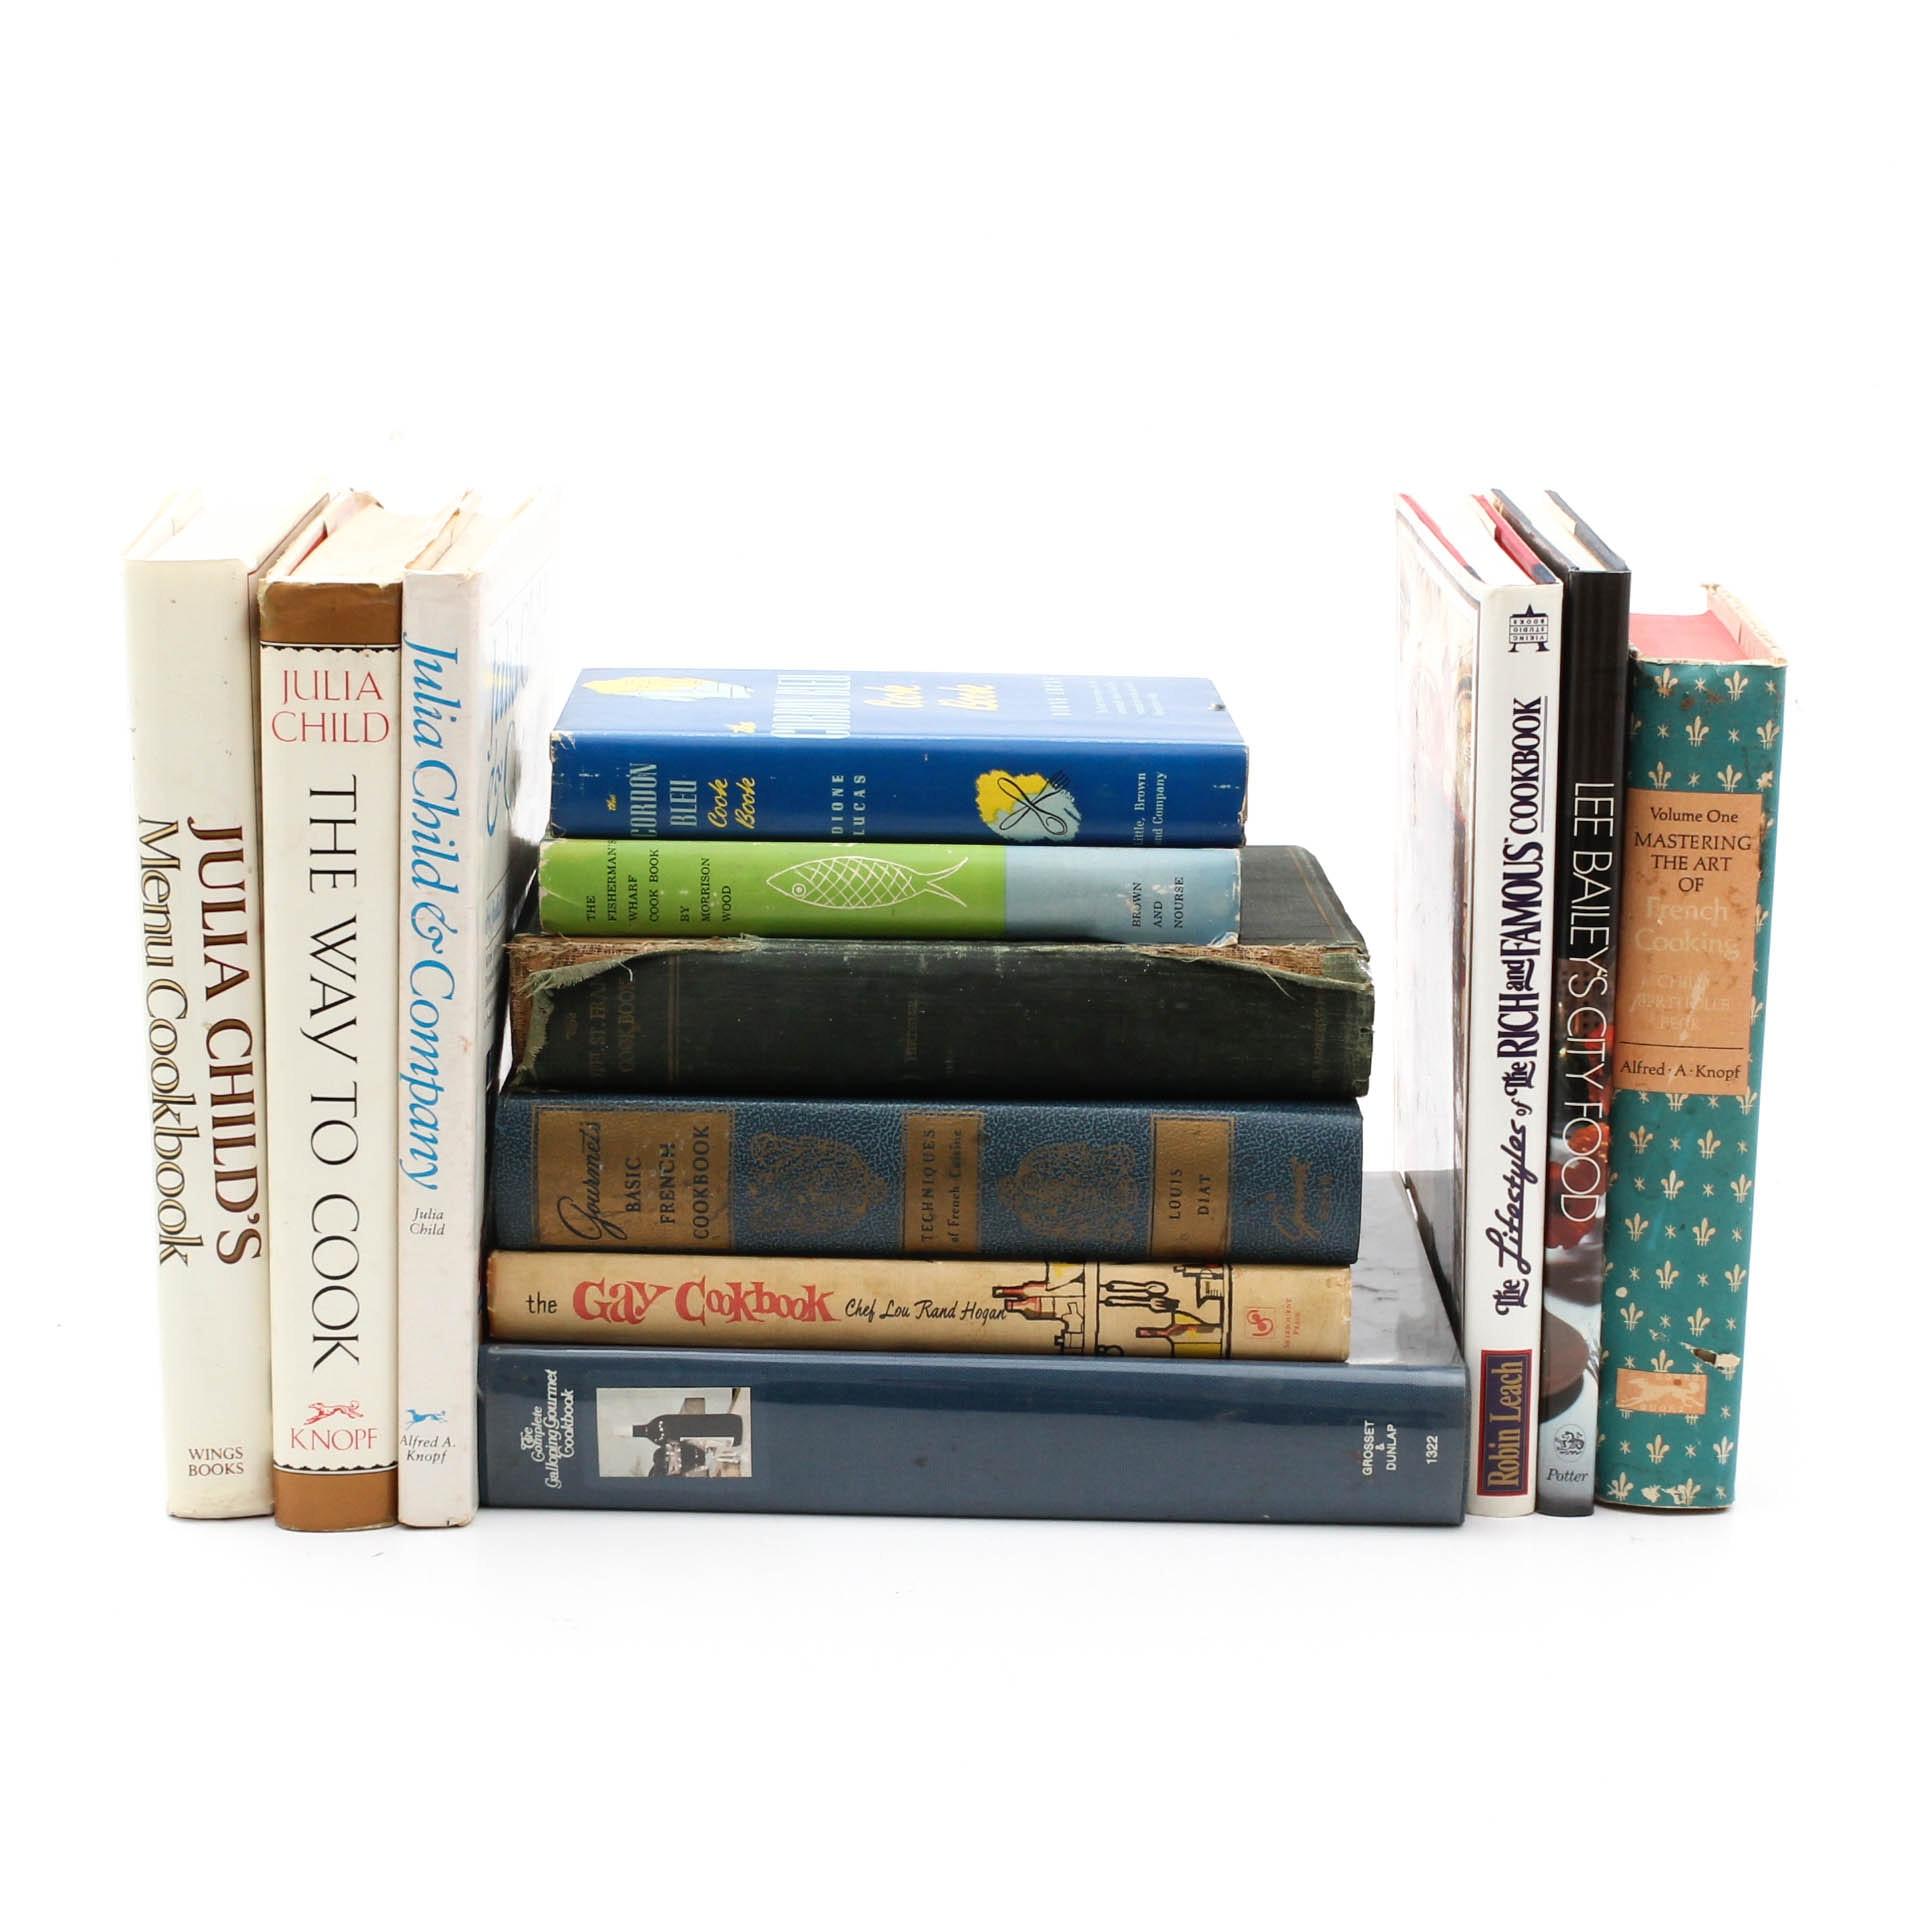 Cookbooks Featuring Julia Child